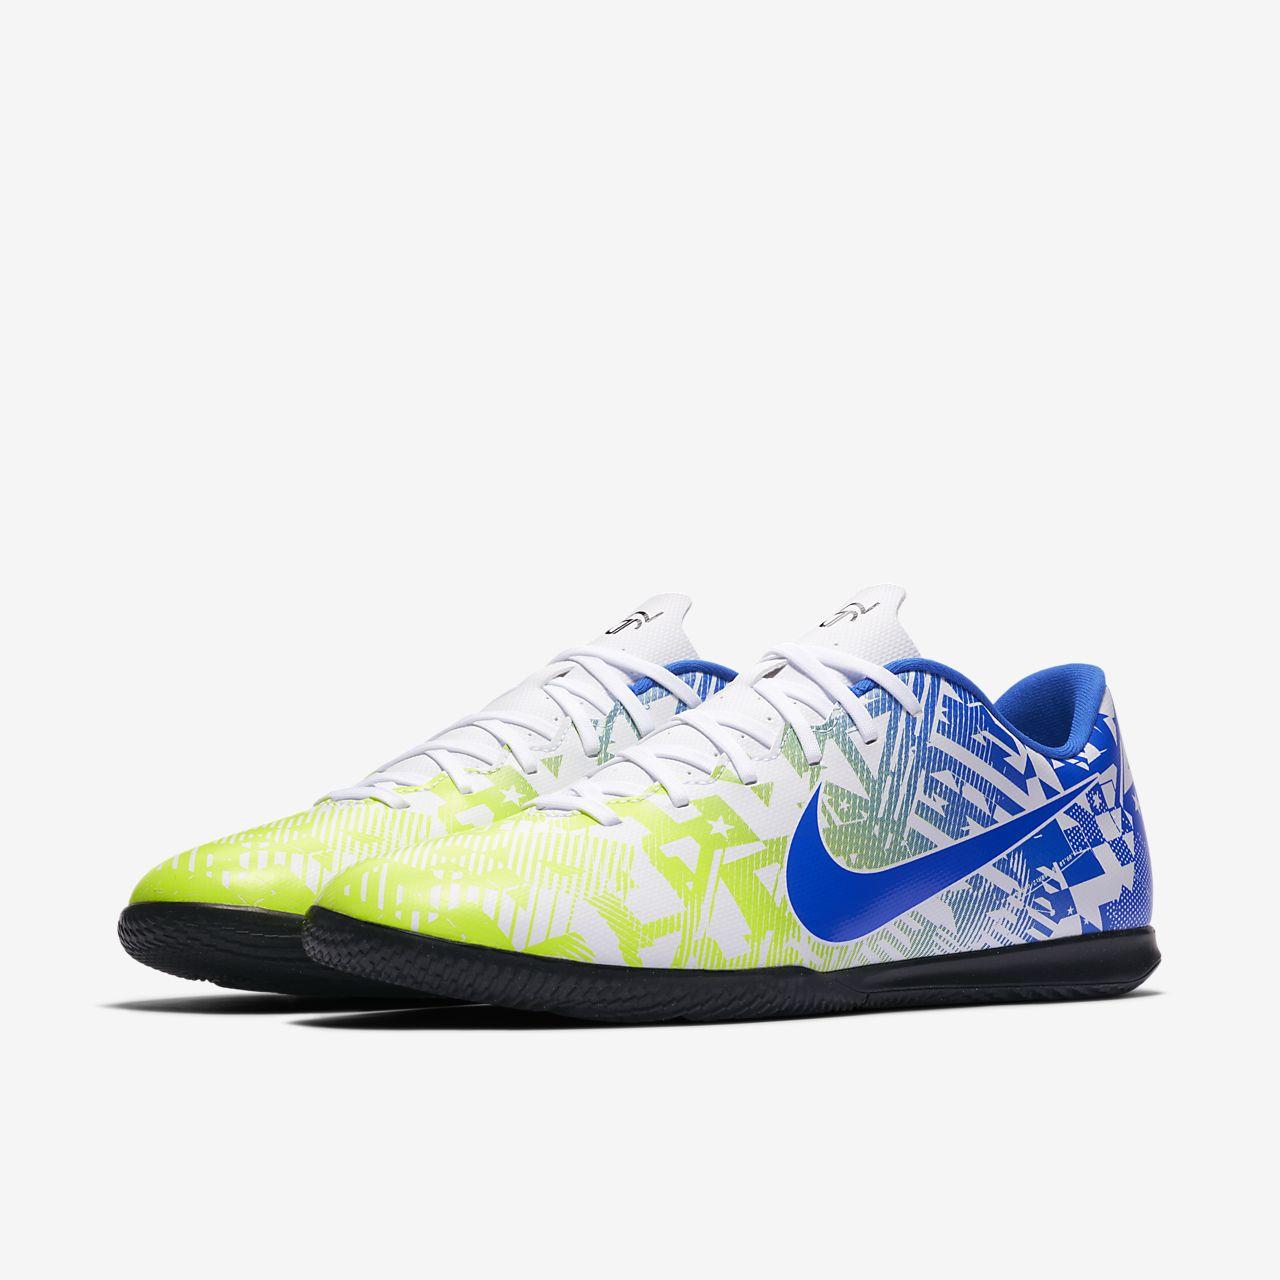 Chaussure de football en salle Nike Mercurial Vapor 13 Club Neymar Jr. IC